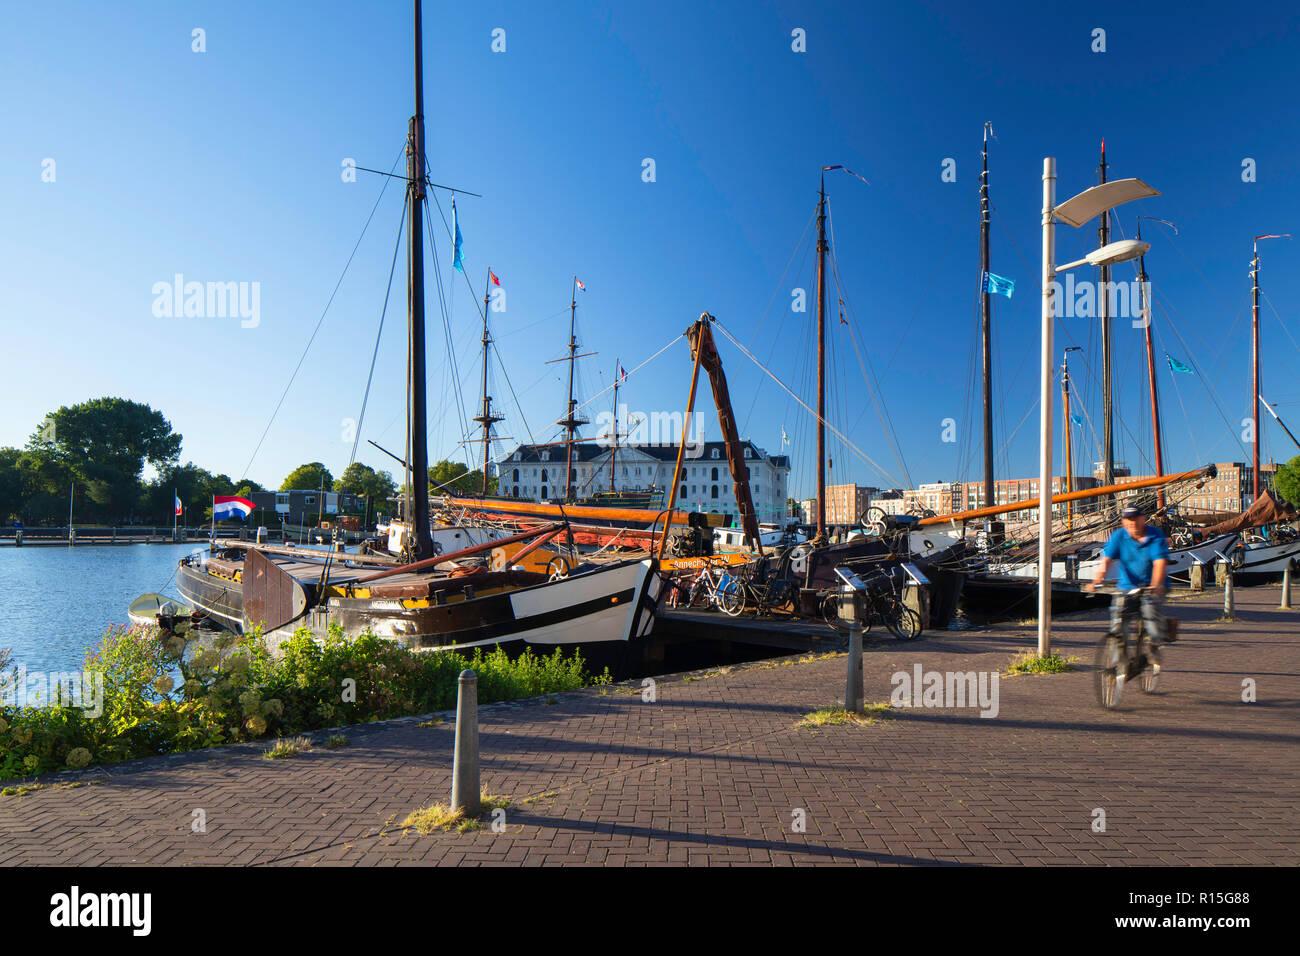 Maritme Museum, Oosterdok, Amsterdam, Noord Holland, Netherlands - Stock Image